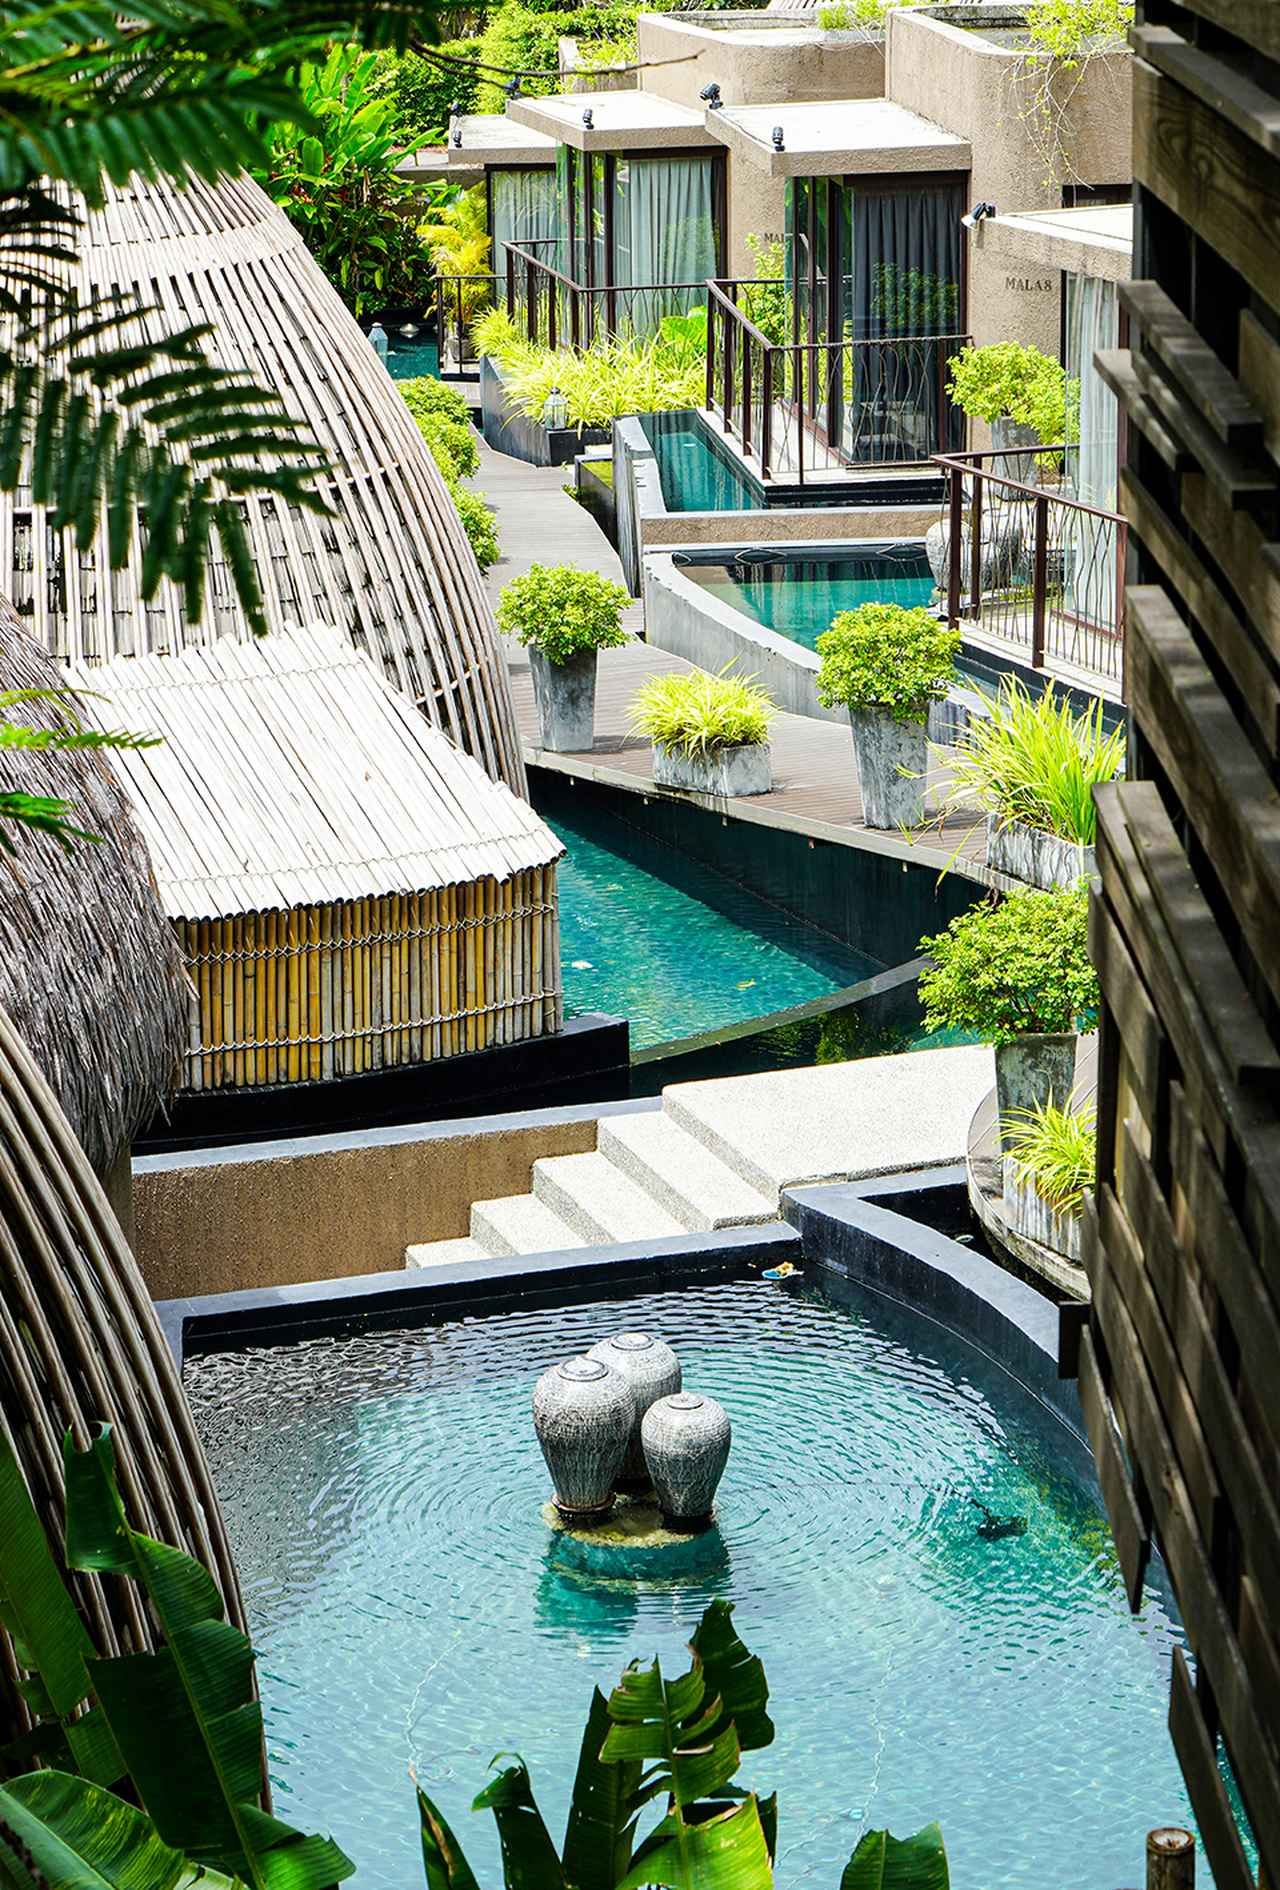 Images : Keemala Phuket(キーマラ プーケット)